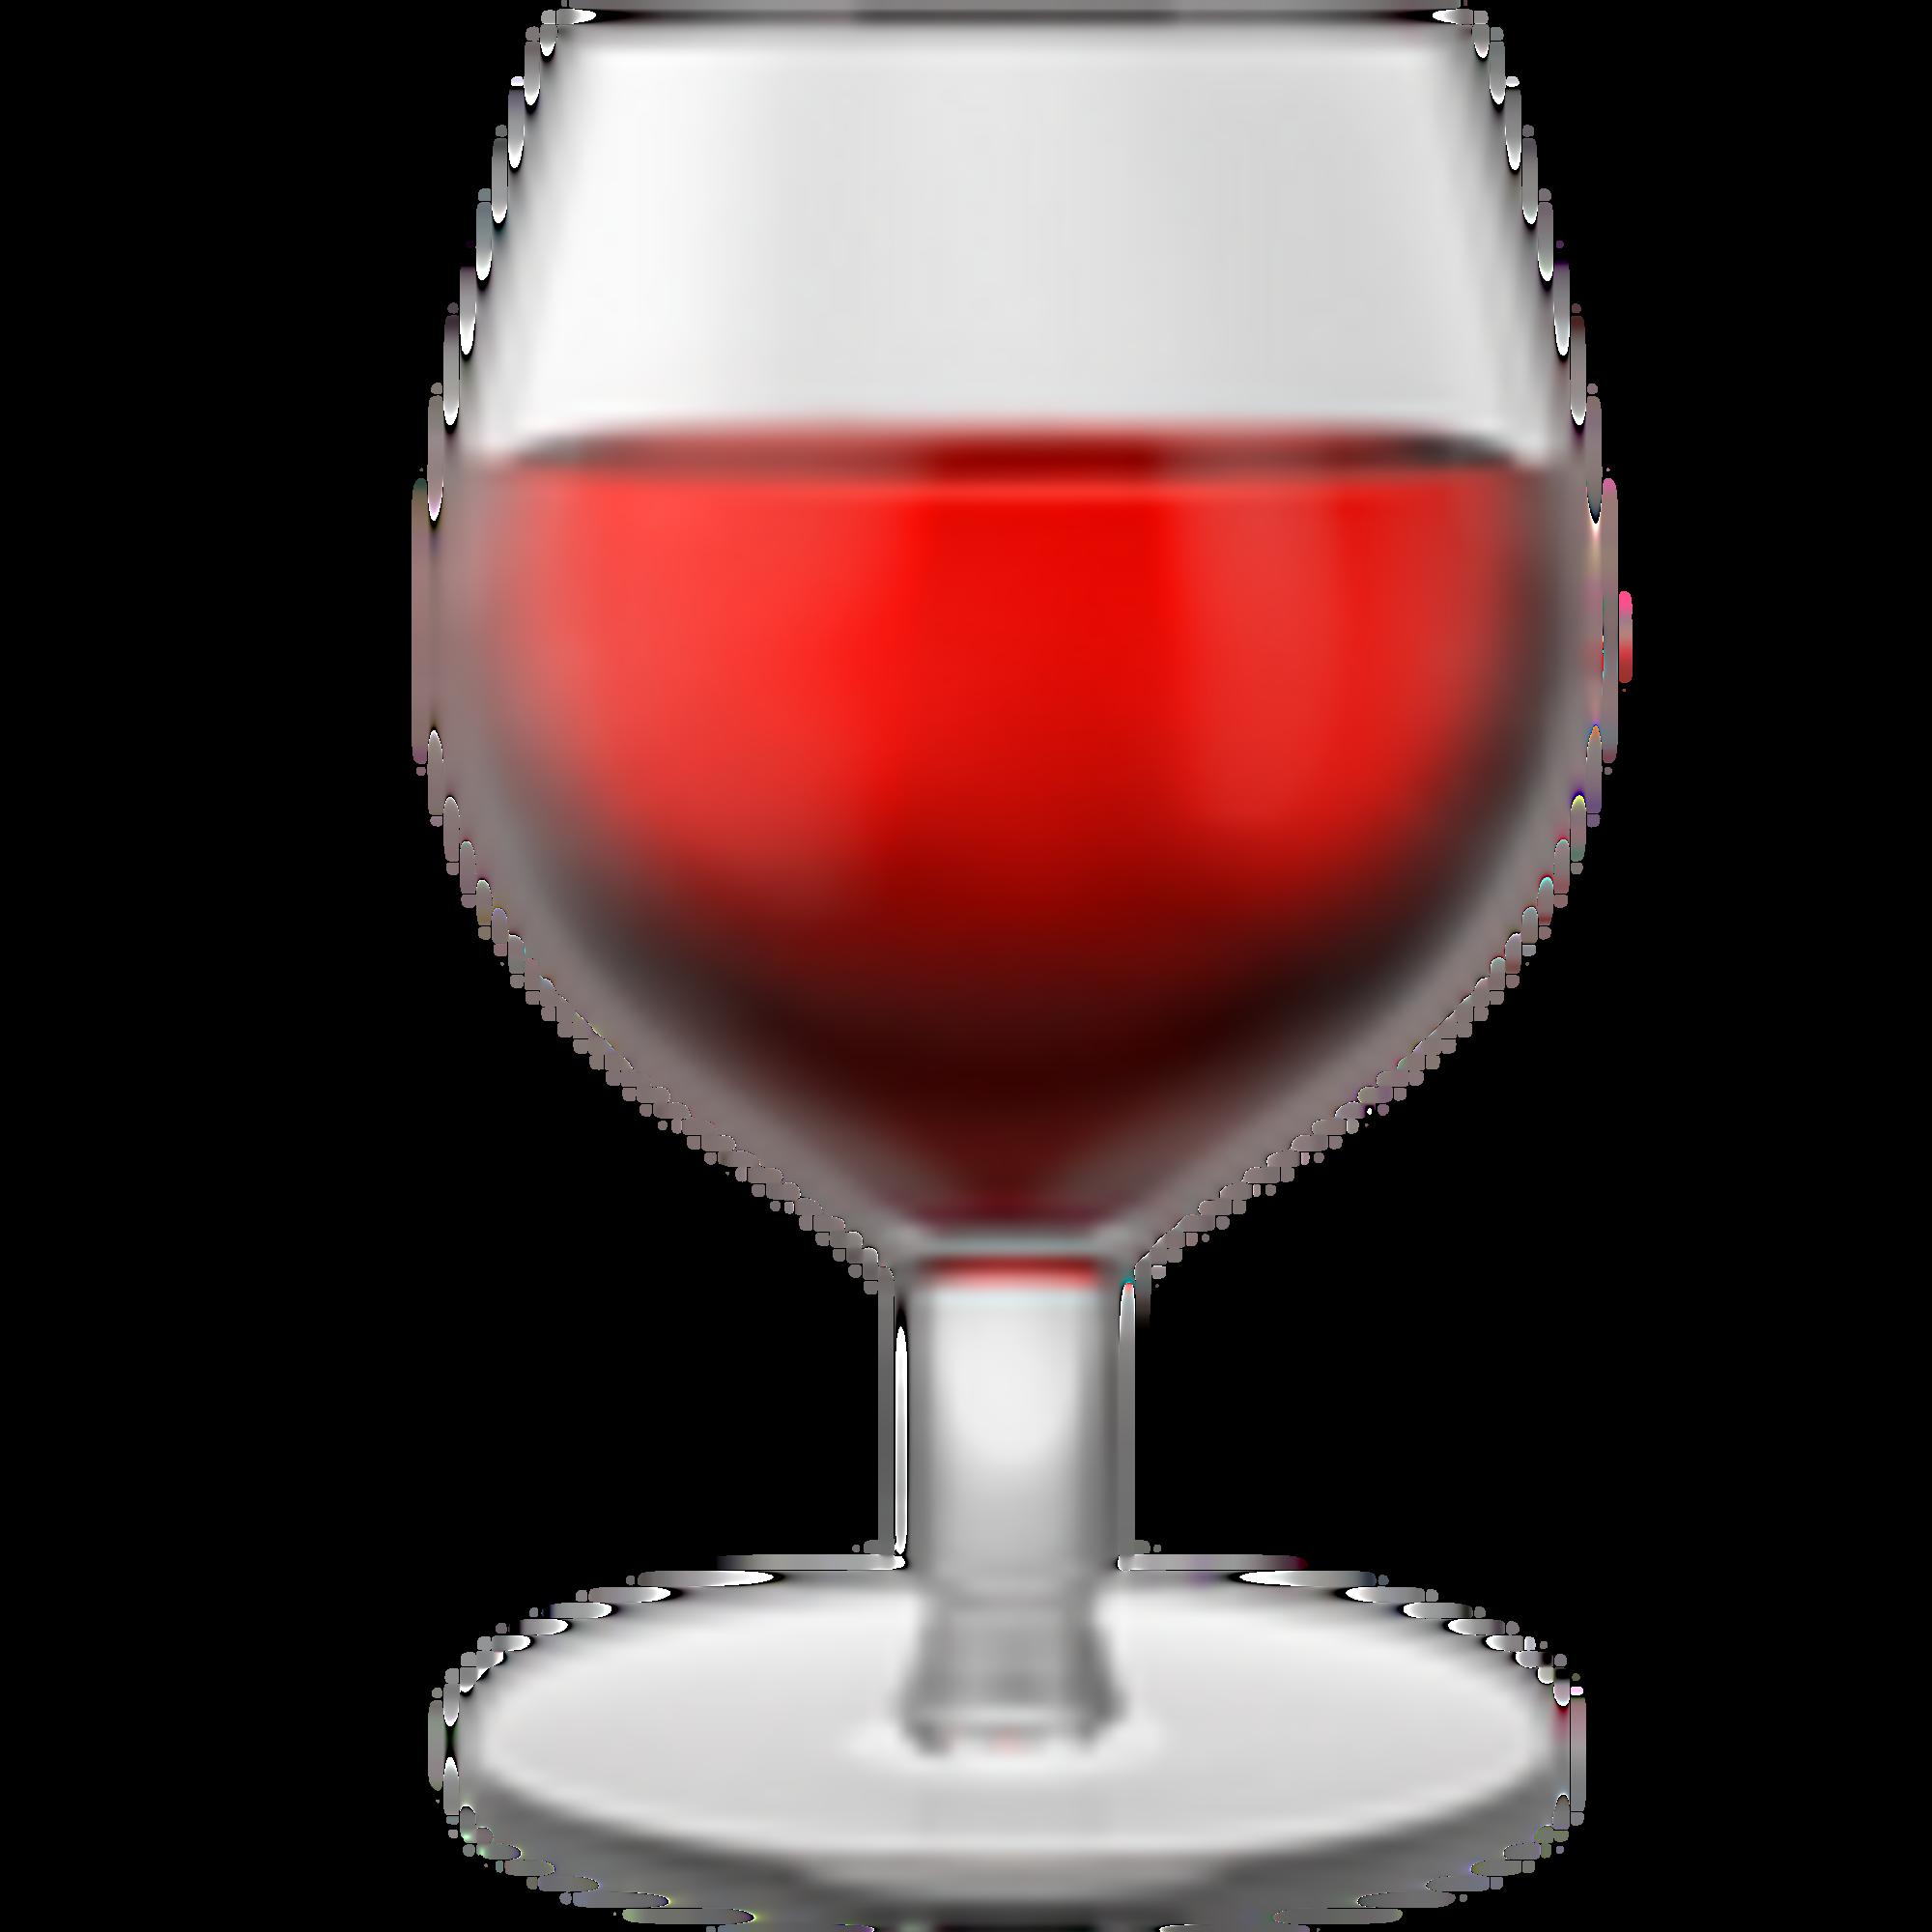 wine-glass_1f377.png